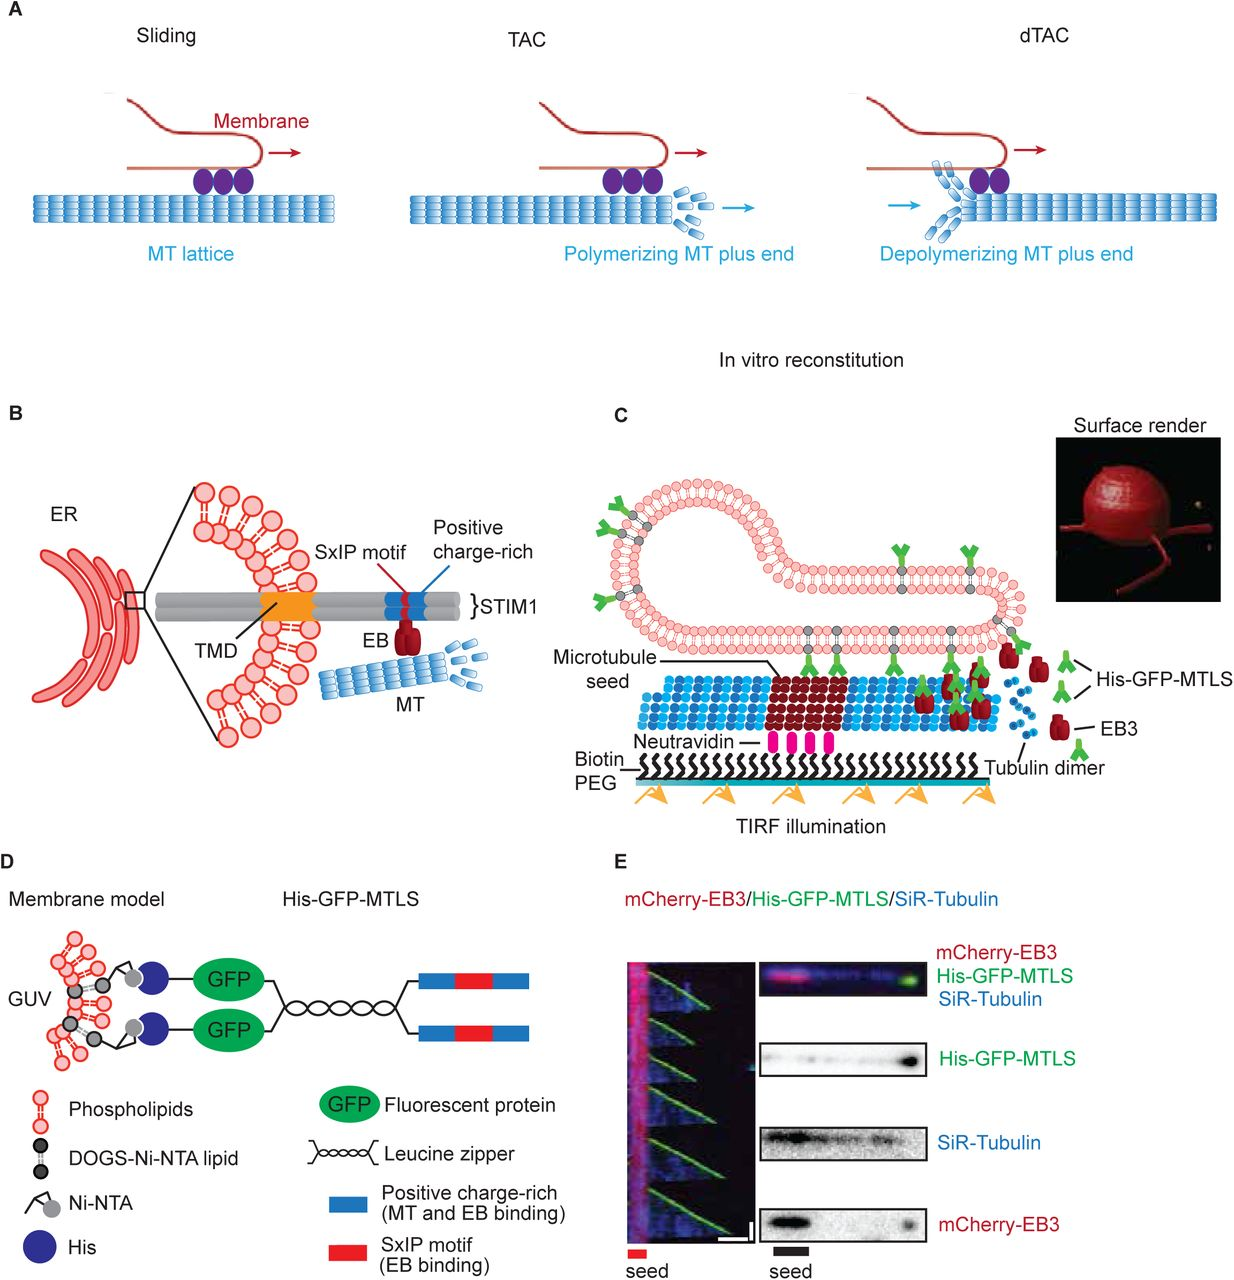 Mechanisms of motor-independent membrane remodeling driven